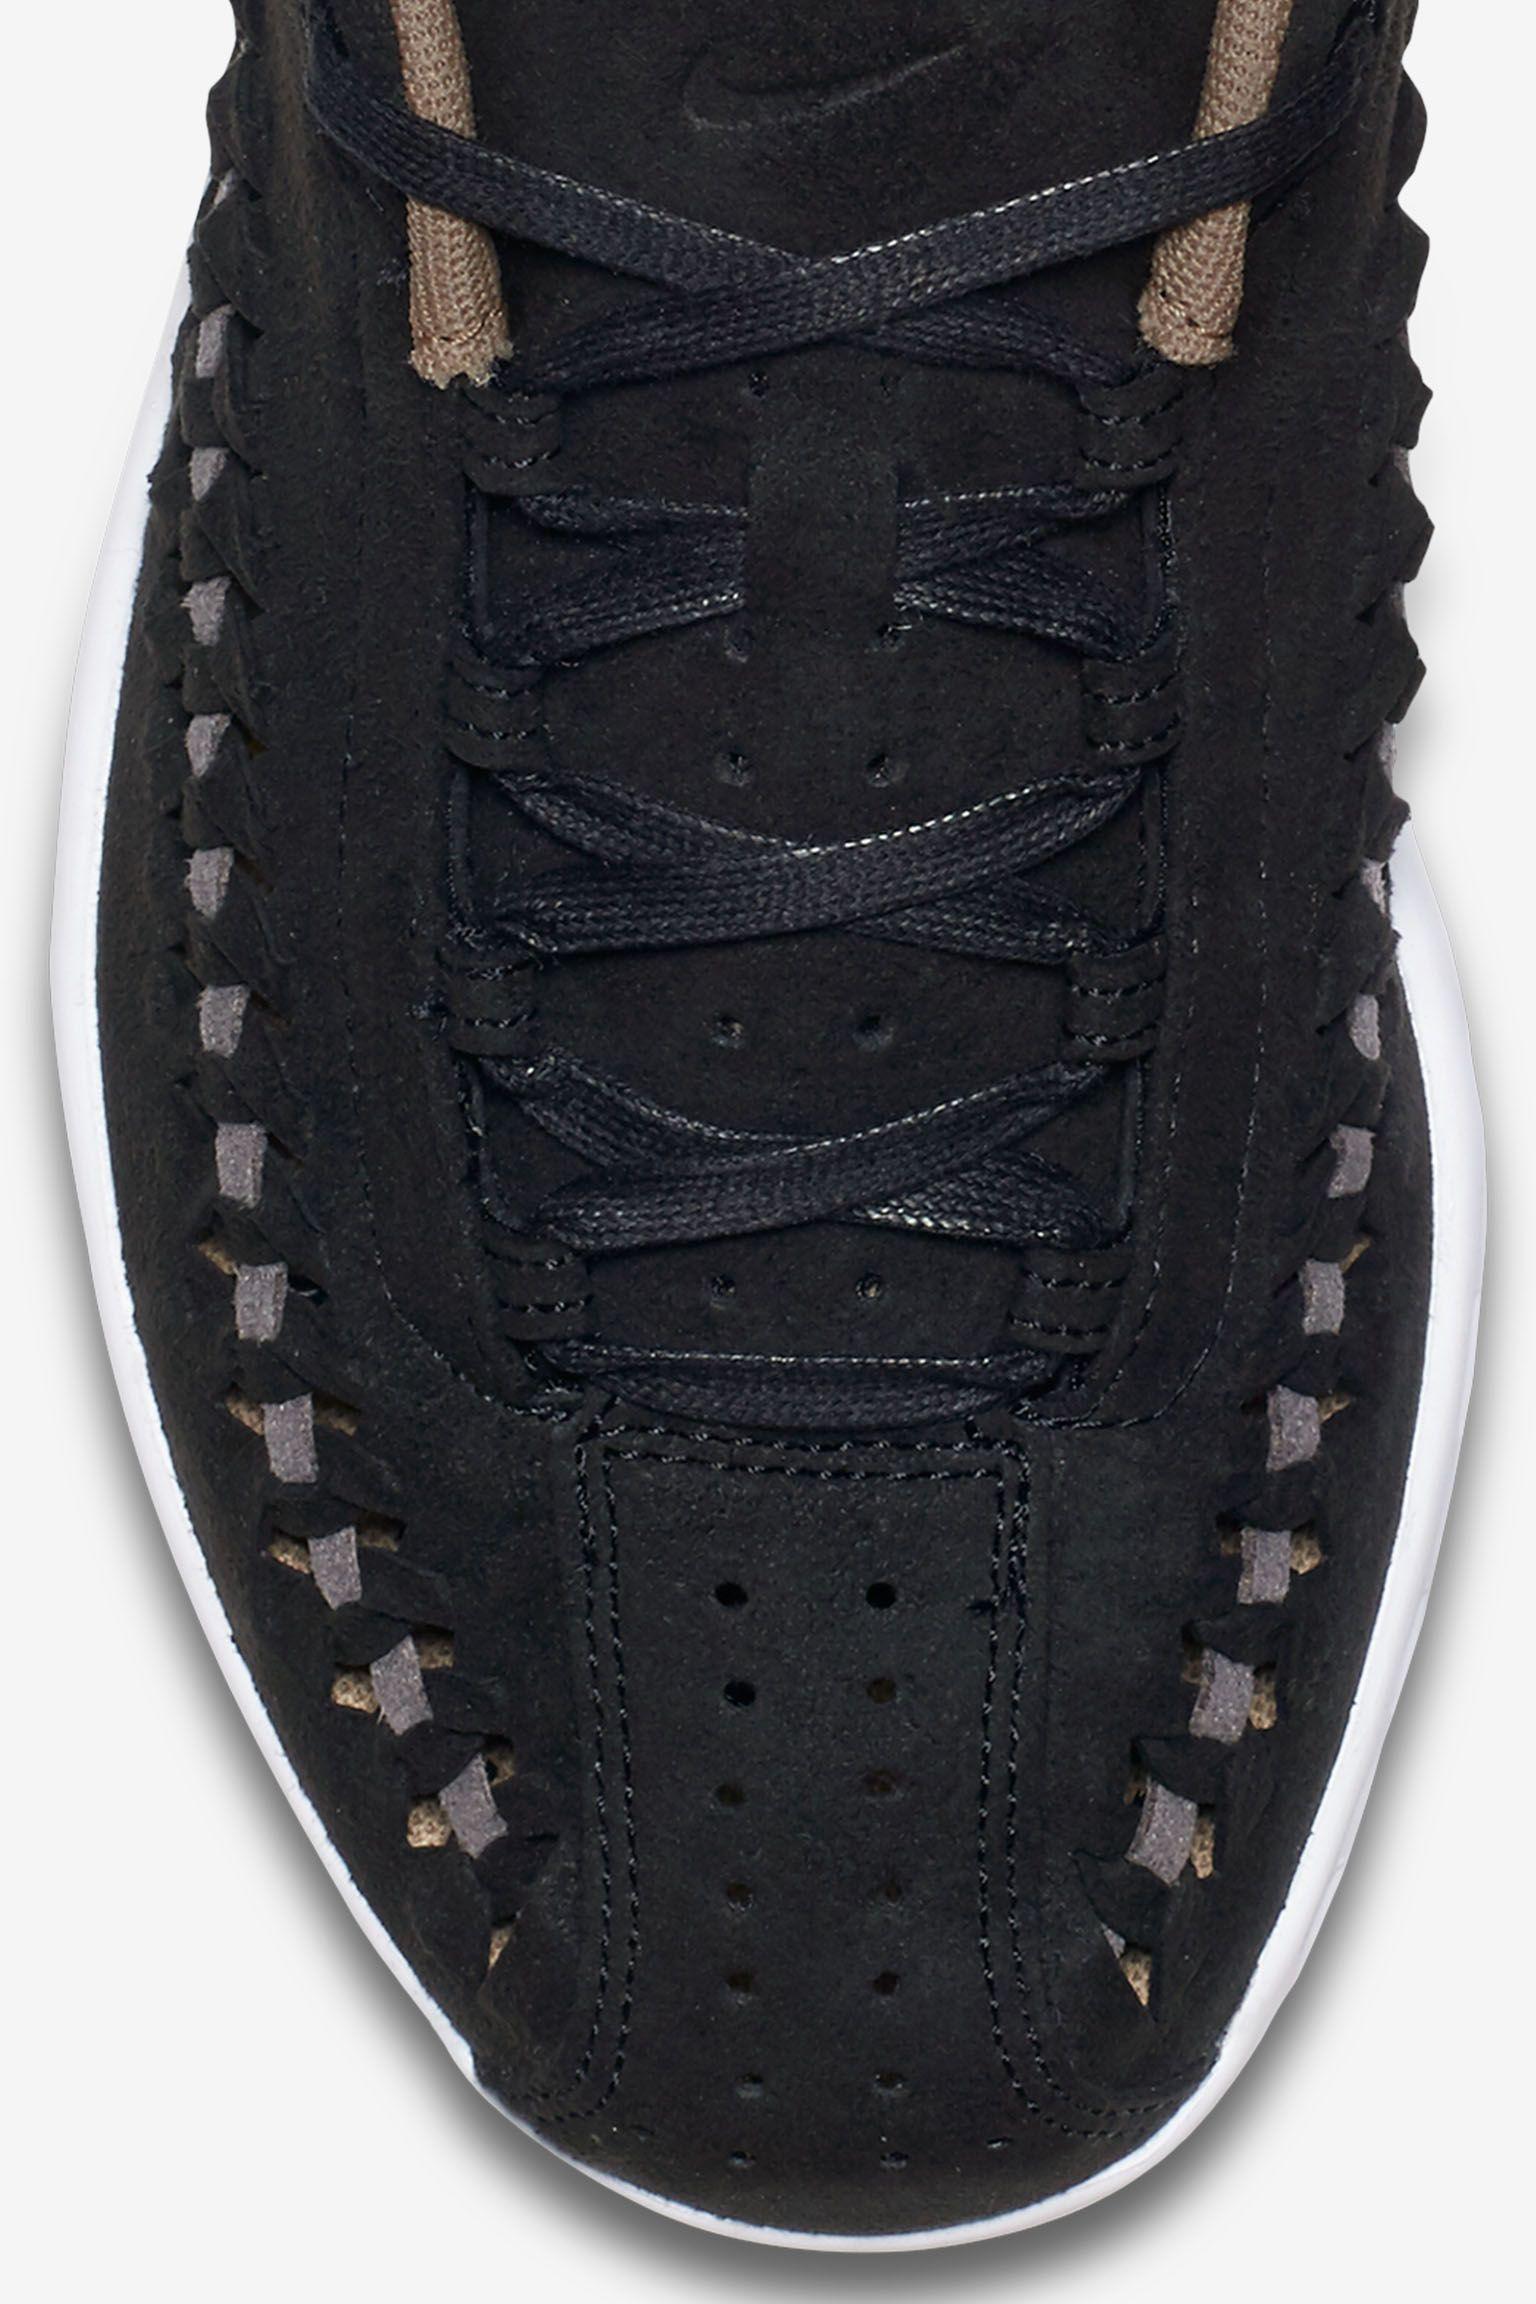 Women's Nike Mayfly Woven 'Black & White'